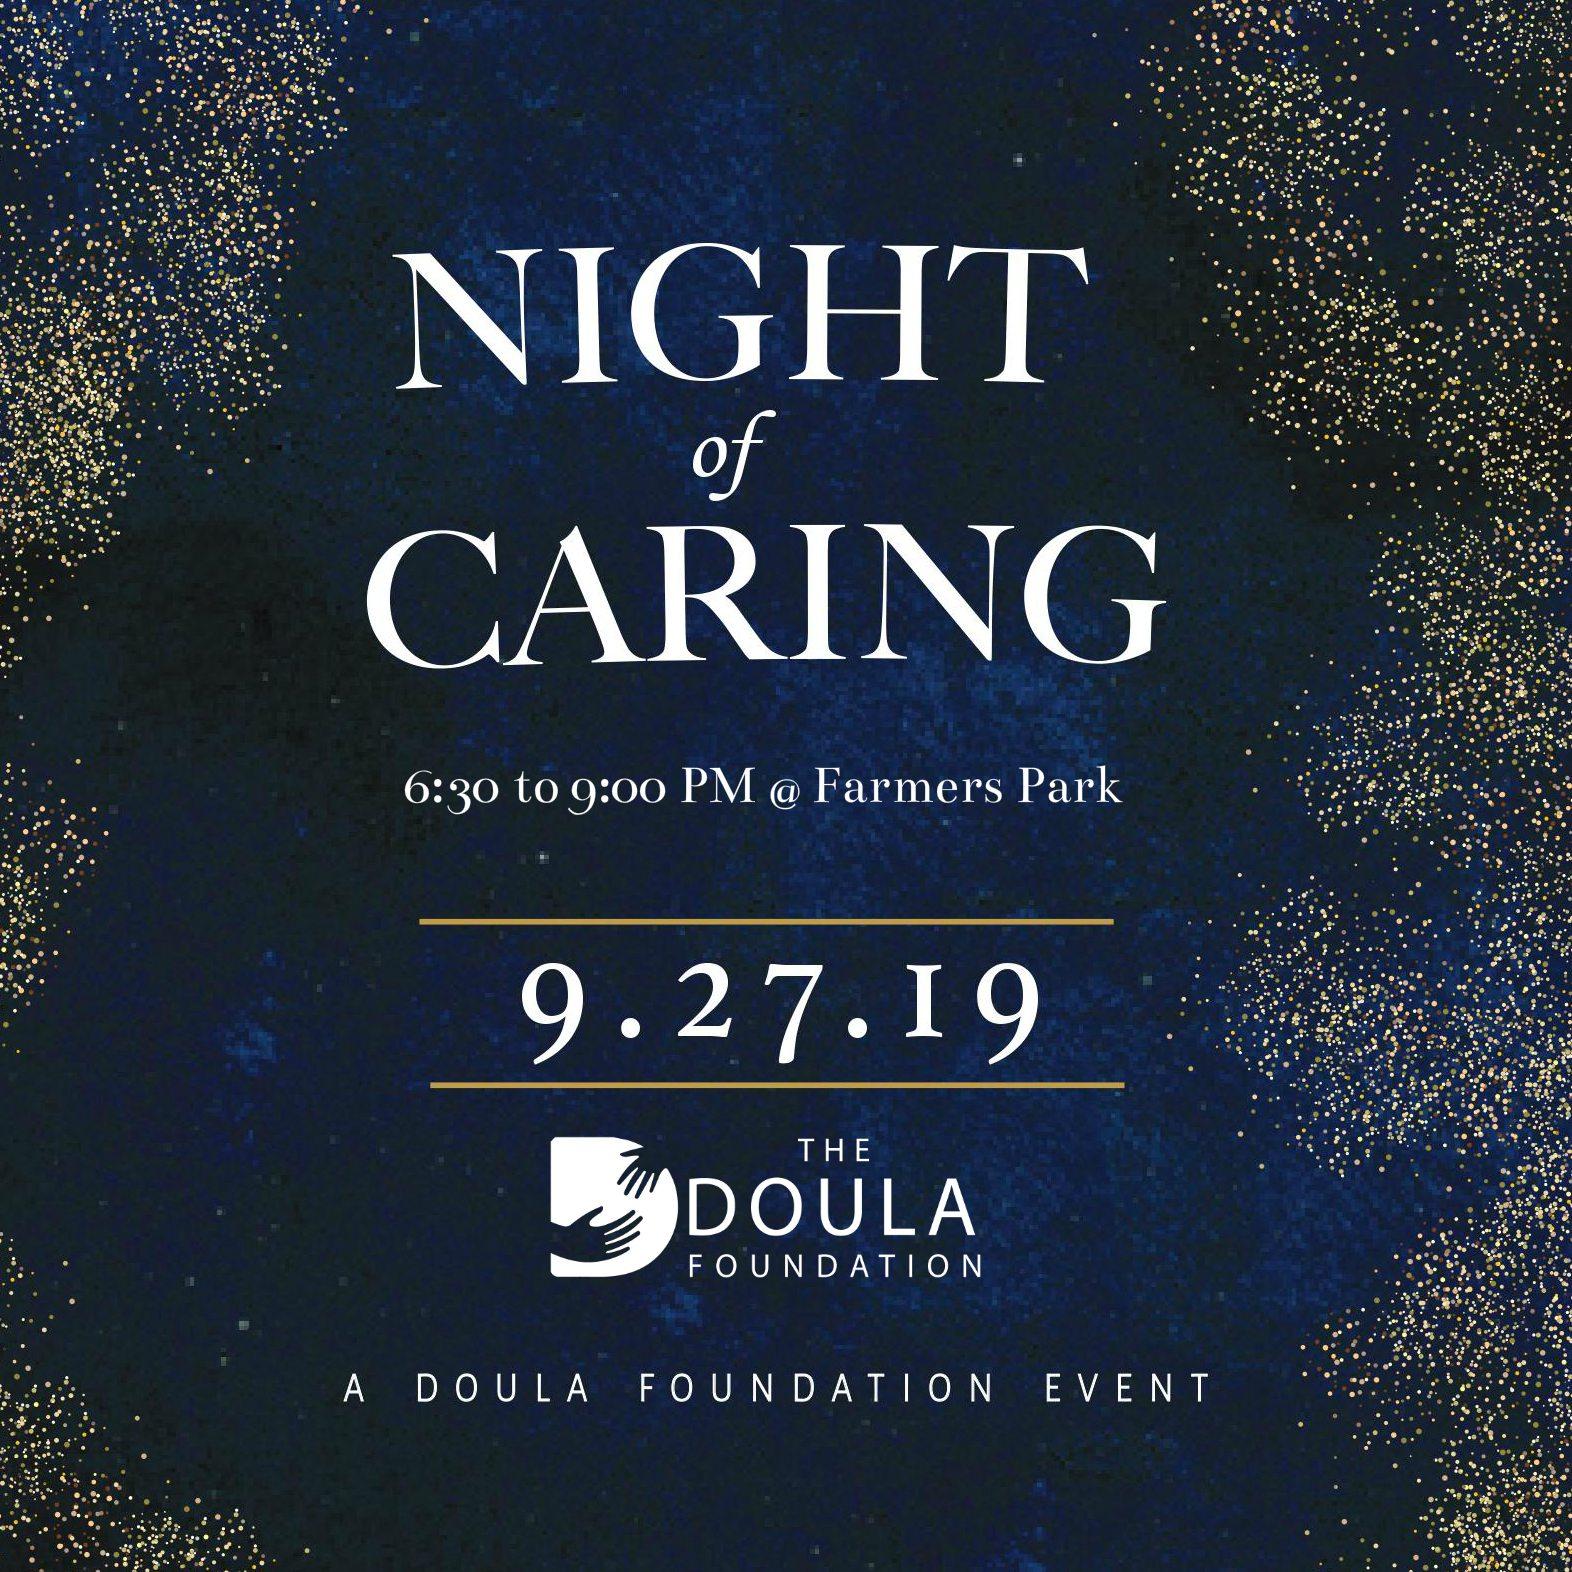 Night of Caring in Springfield, MO